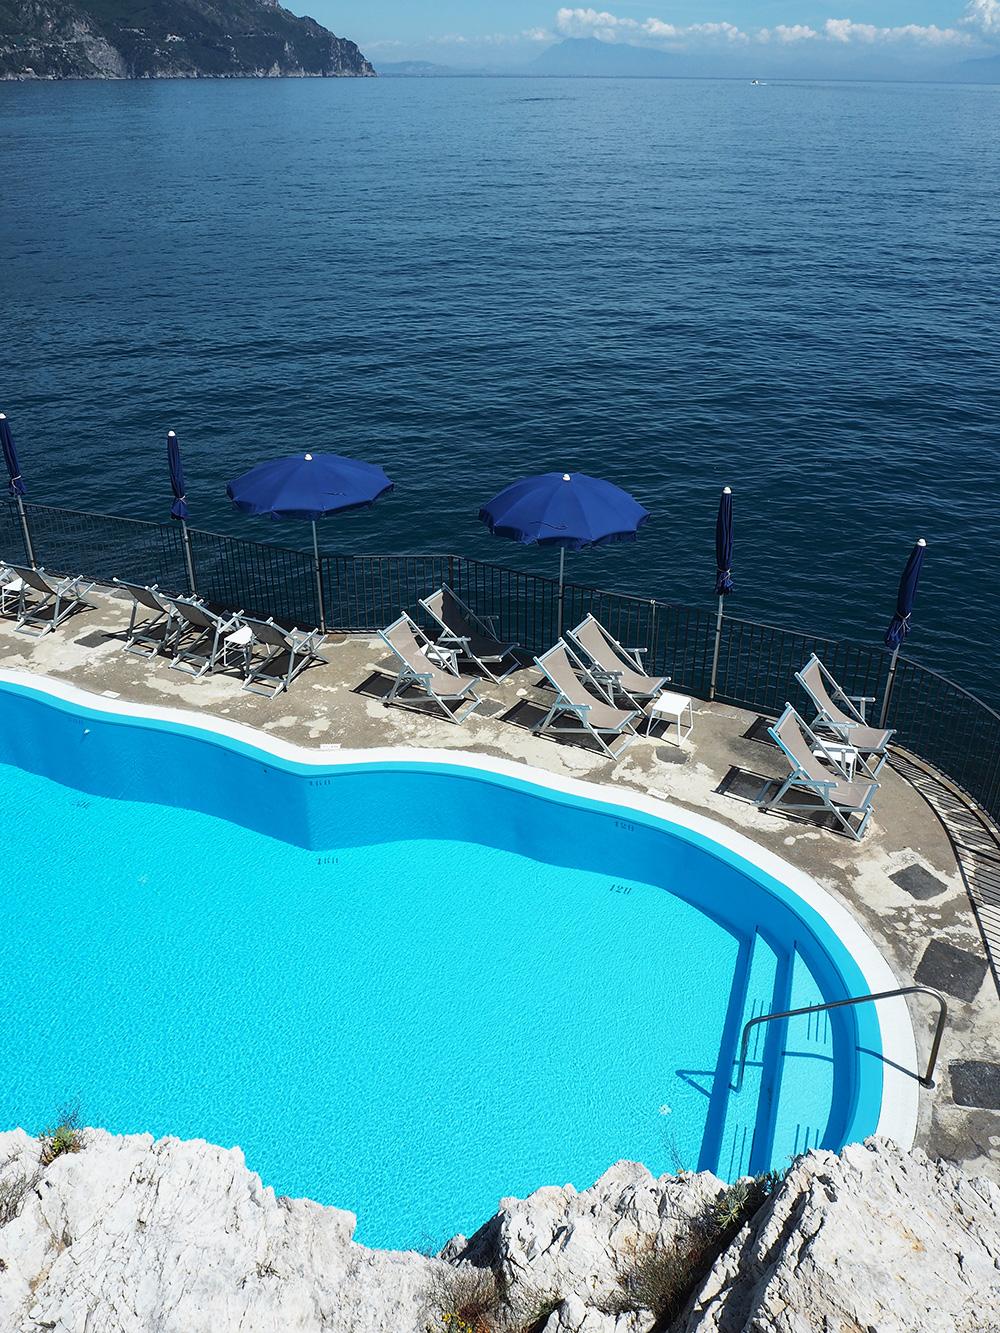 RosyCheeks-Amalfi-Hotel-Lunca-Convento-pool